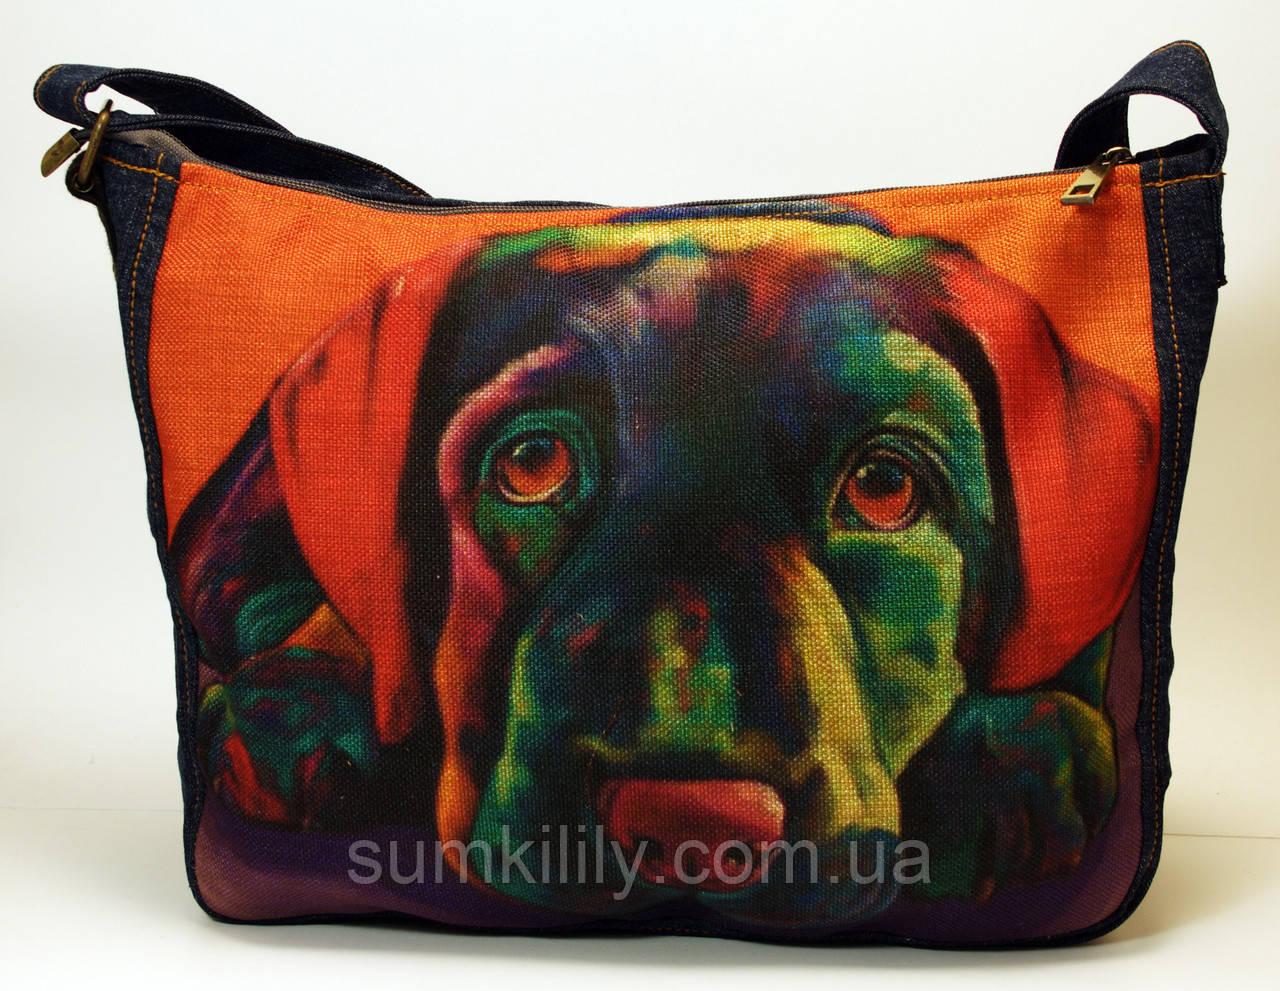 Джинсовая сумочка Лабрадор